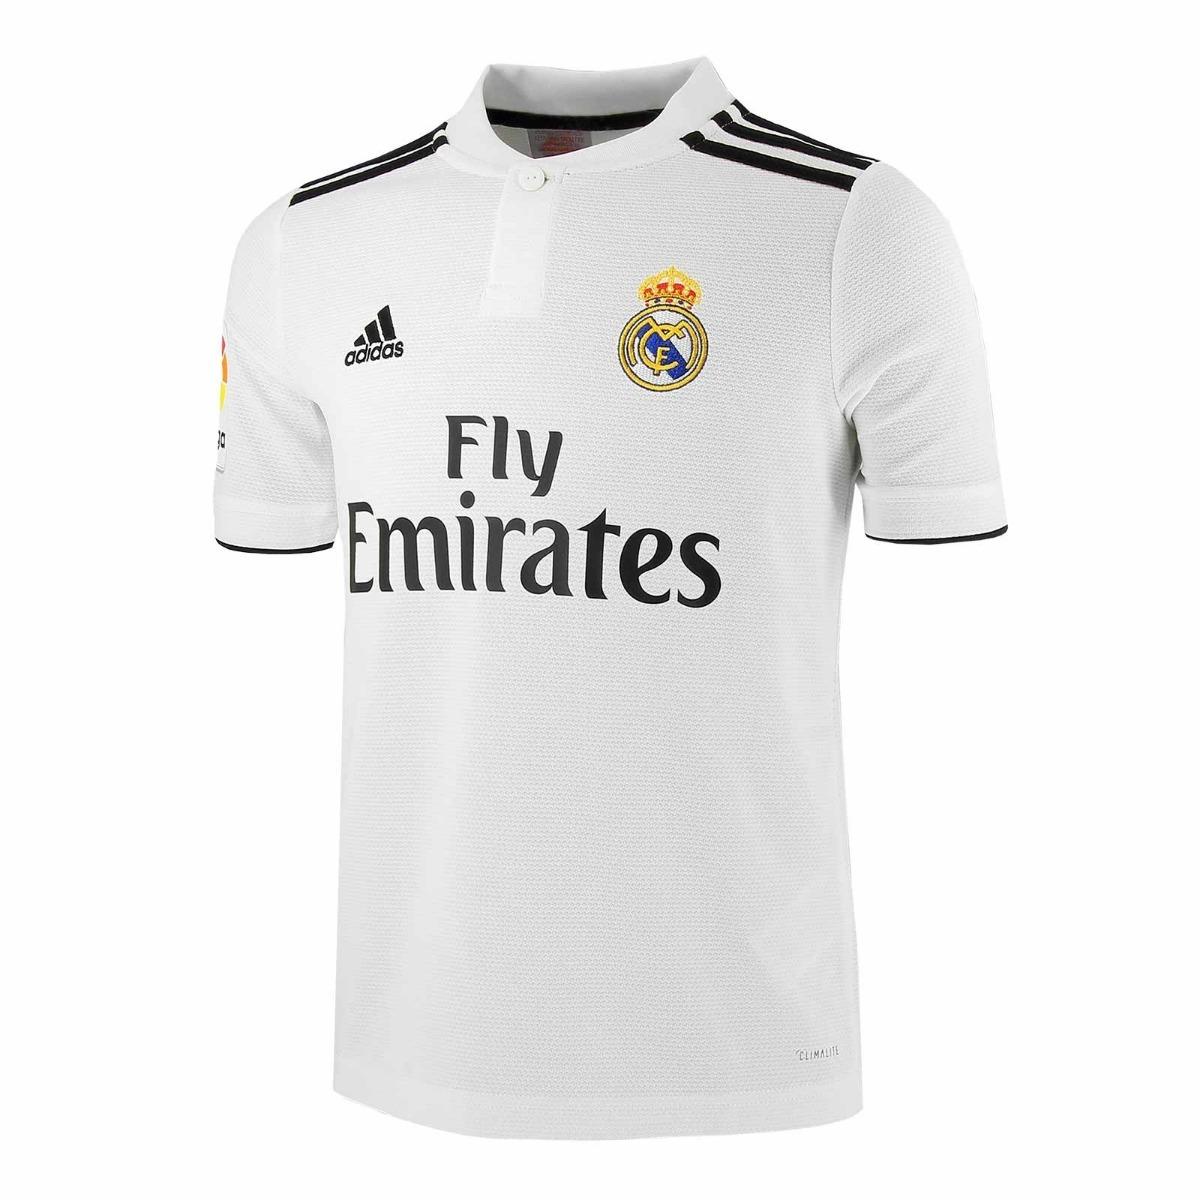 7f33e619ad874 jersey playera blanca del real madrid champions 2018 2019. Cargando zoom.